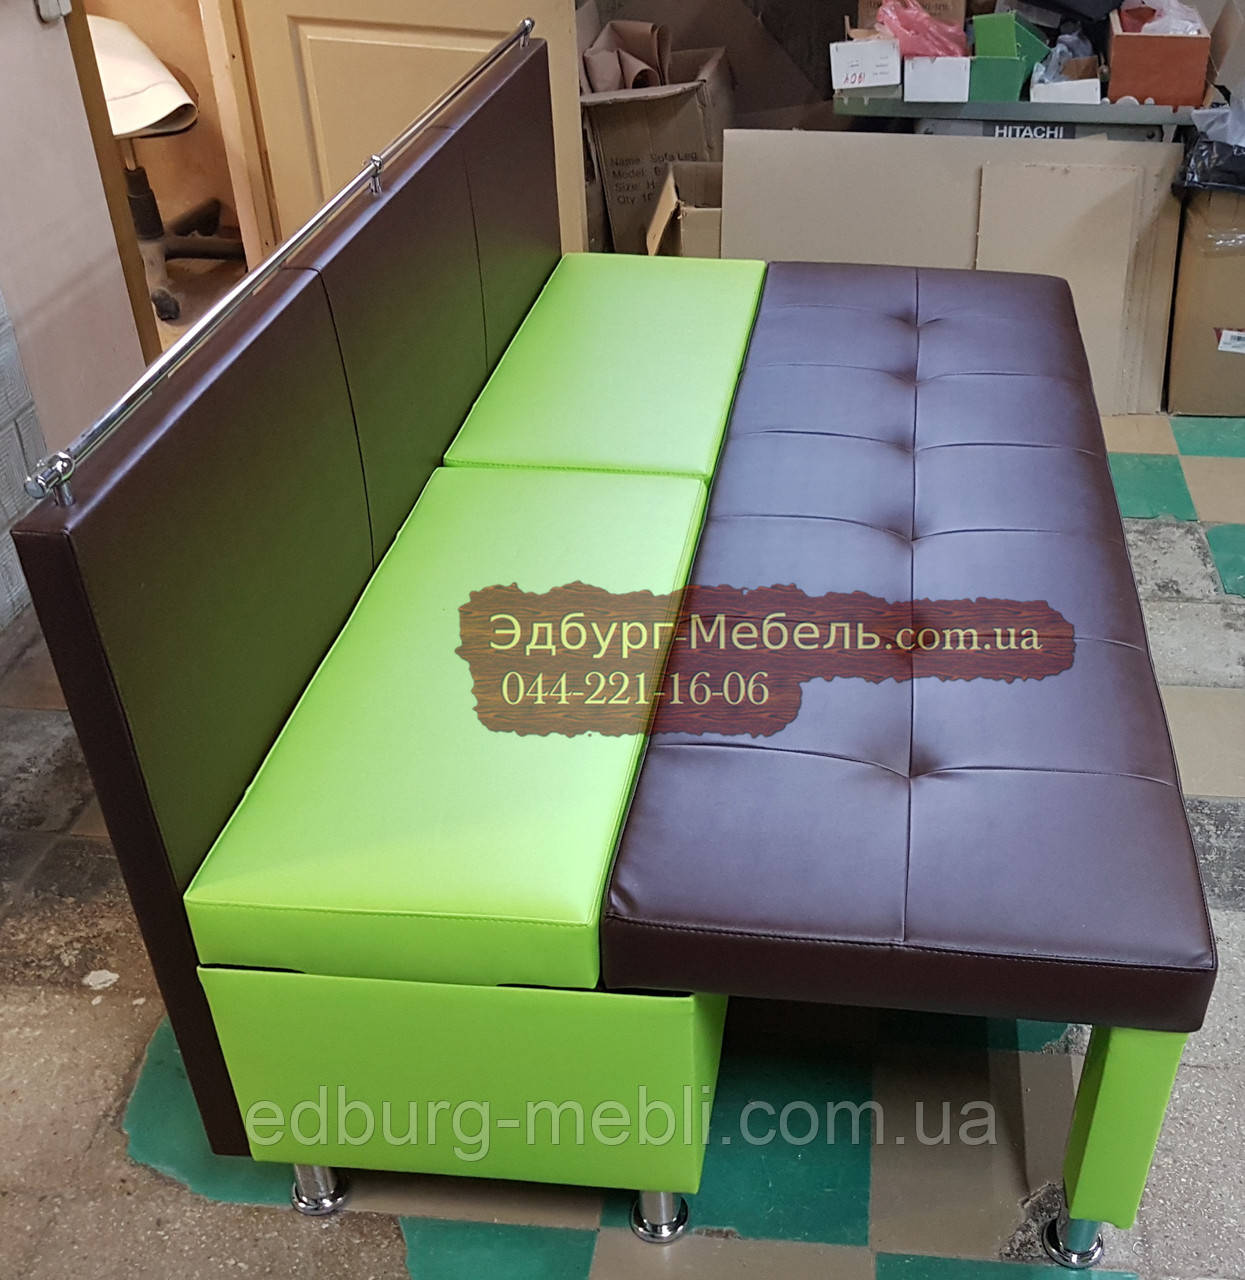 Диван для узкой кухни, коридора с ящиком + спальным местом 1800х600х850мм - фото 6